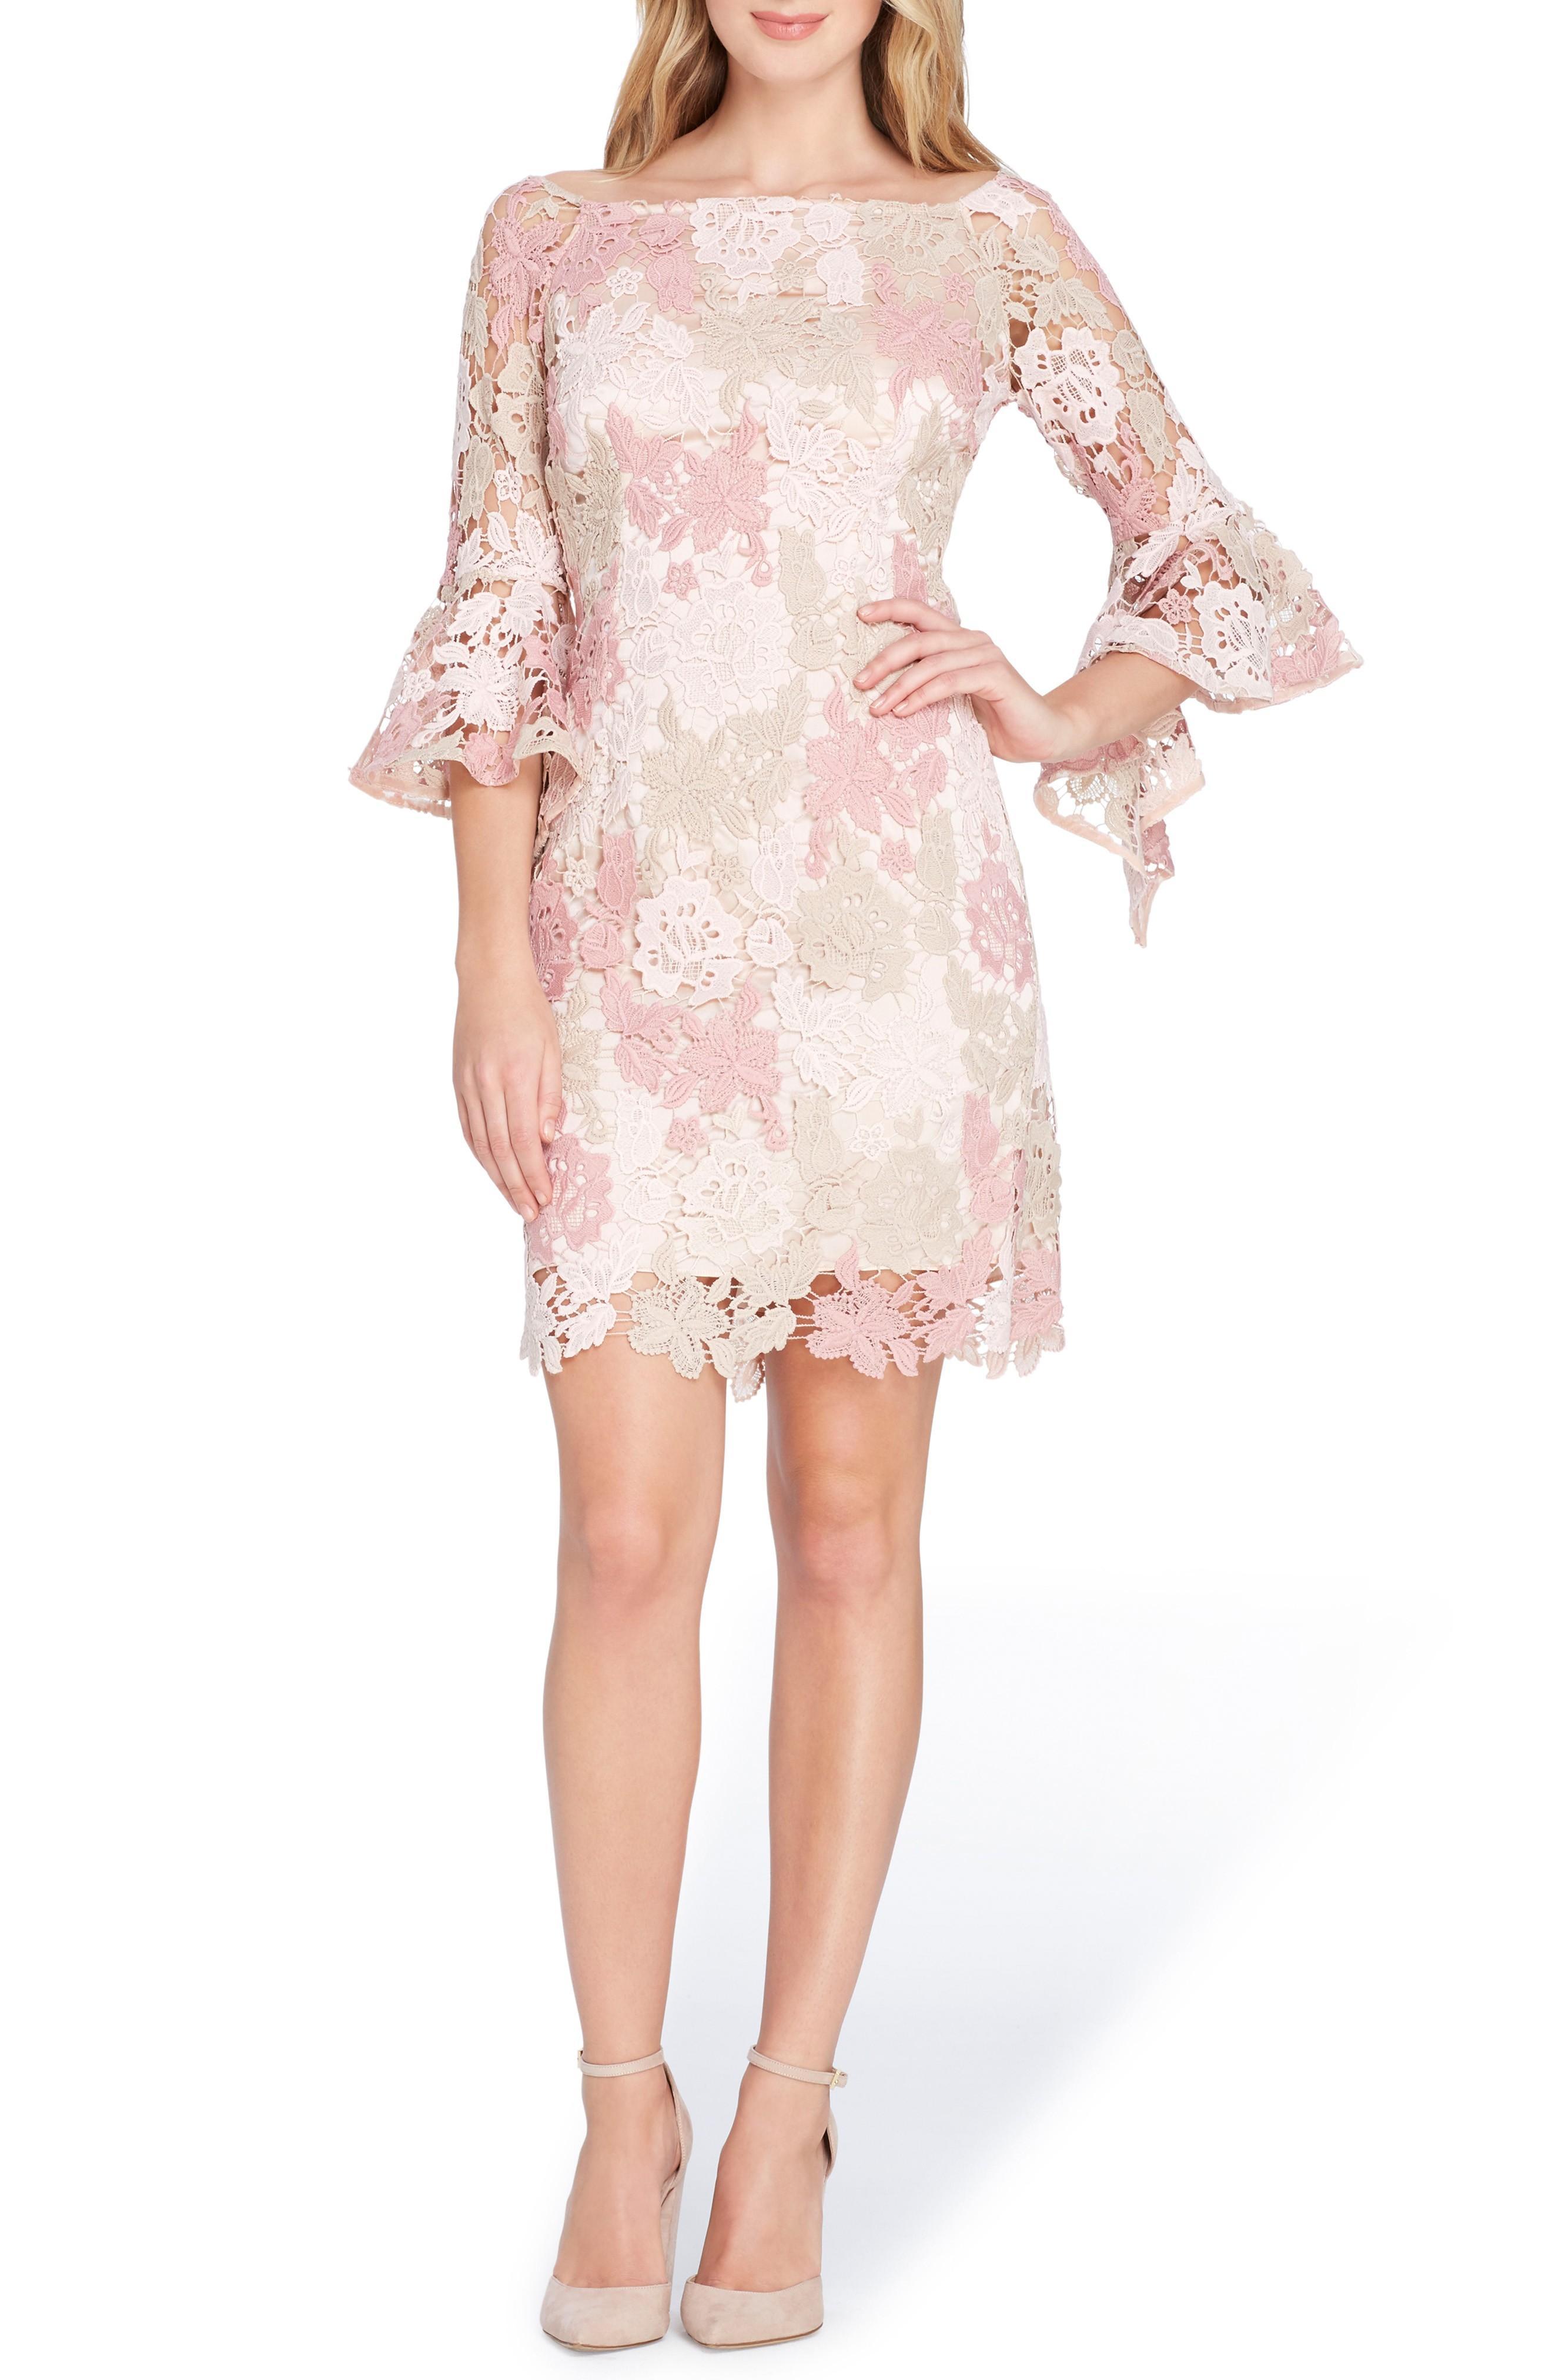 Tahari Lace Bell Sleeve Sheath Dress In Blush/ Rose/ Taupe